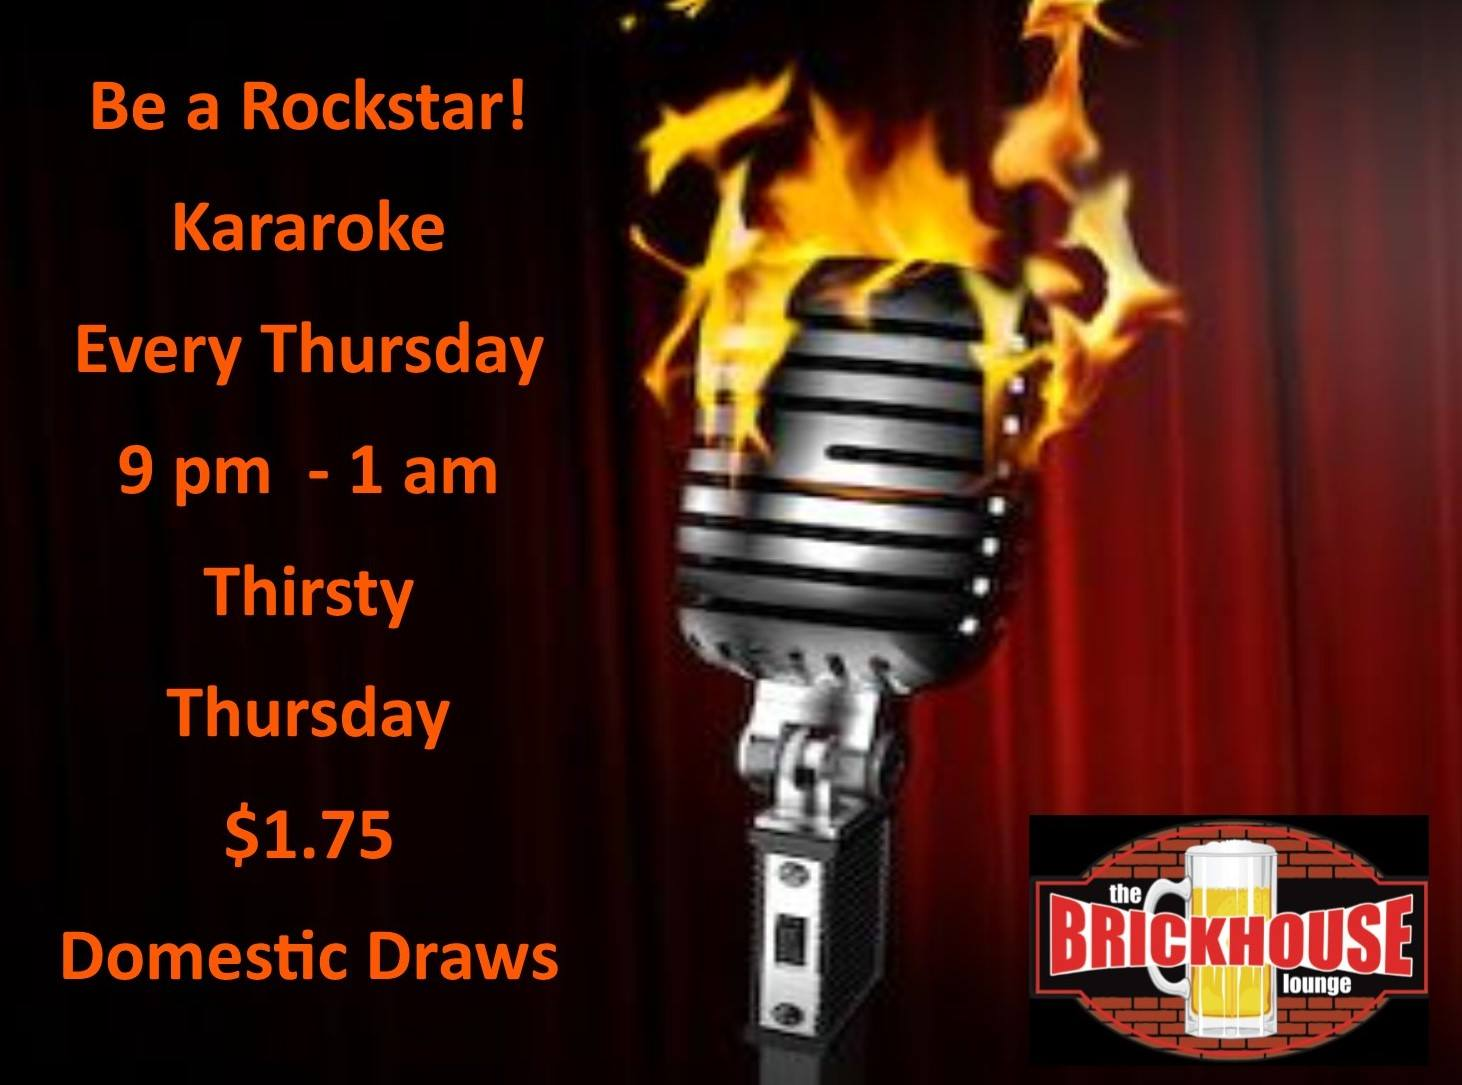 brickhouse_karaoke.jpg